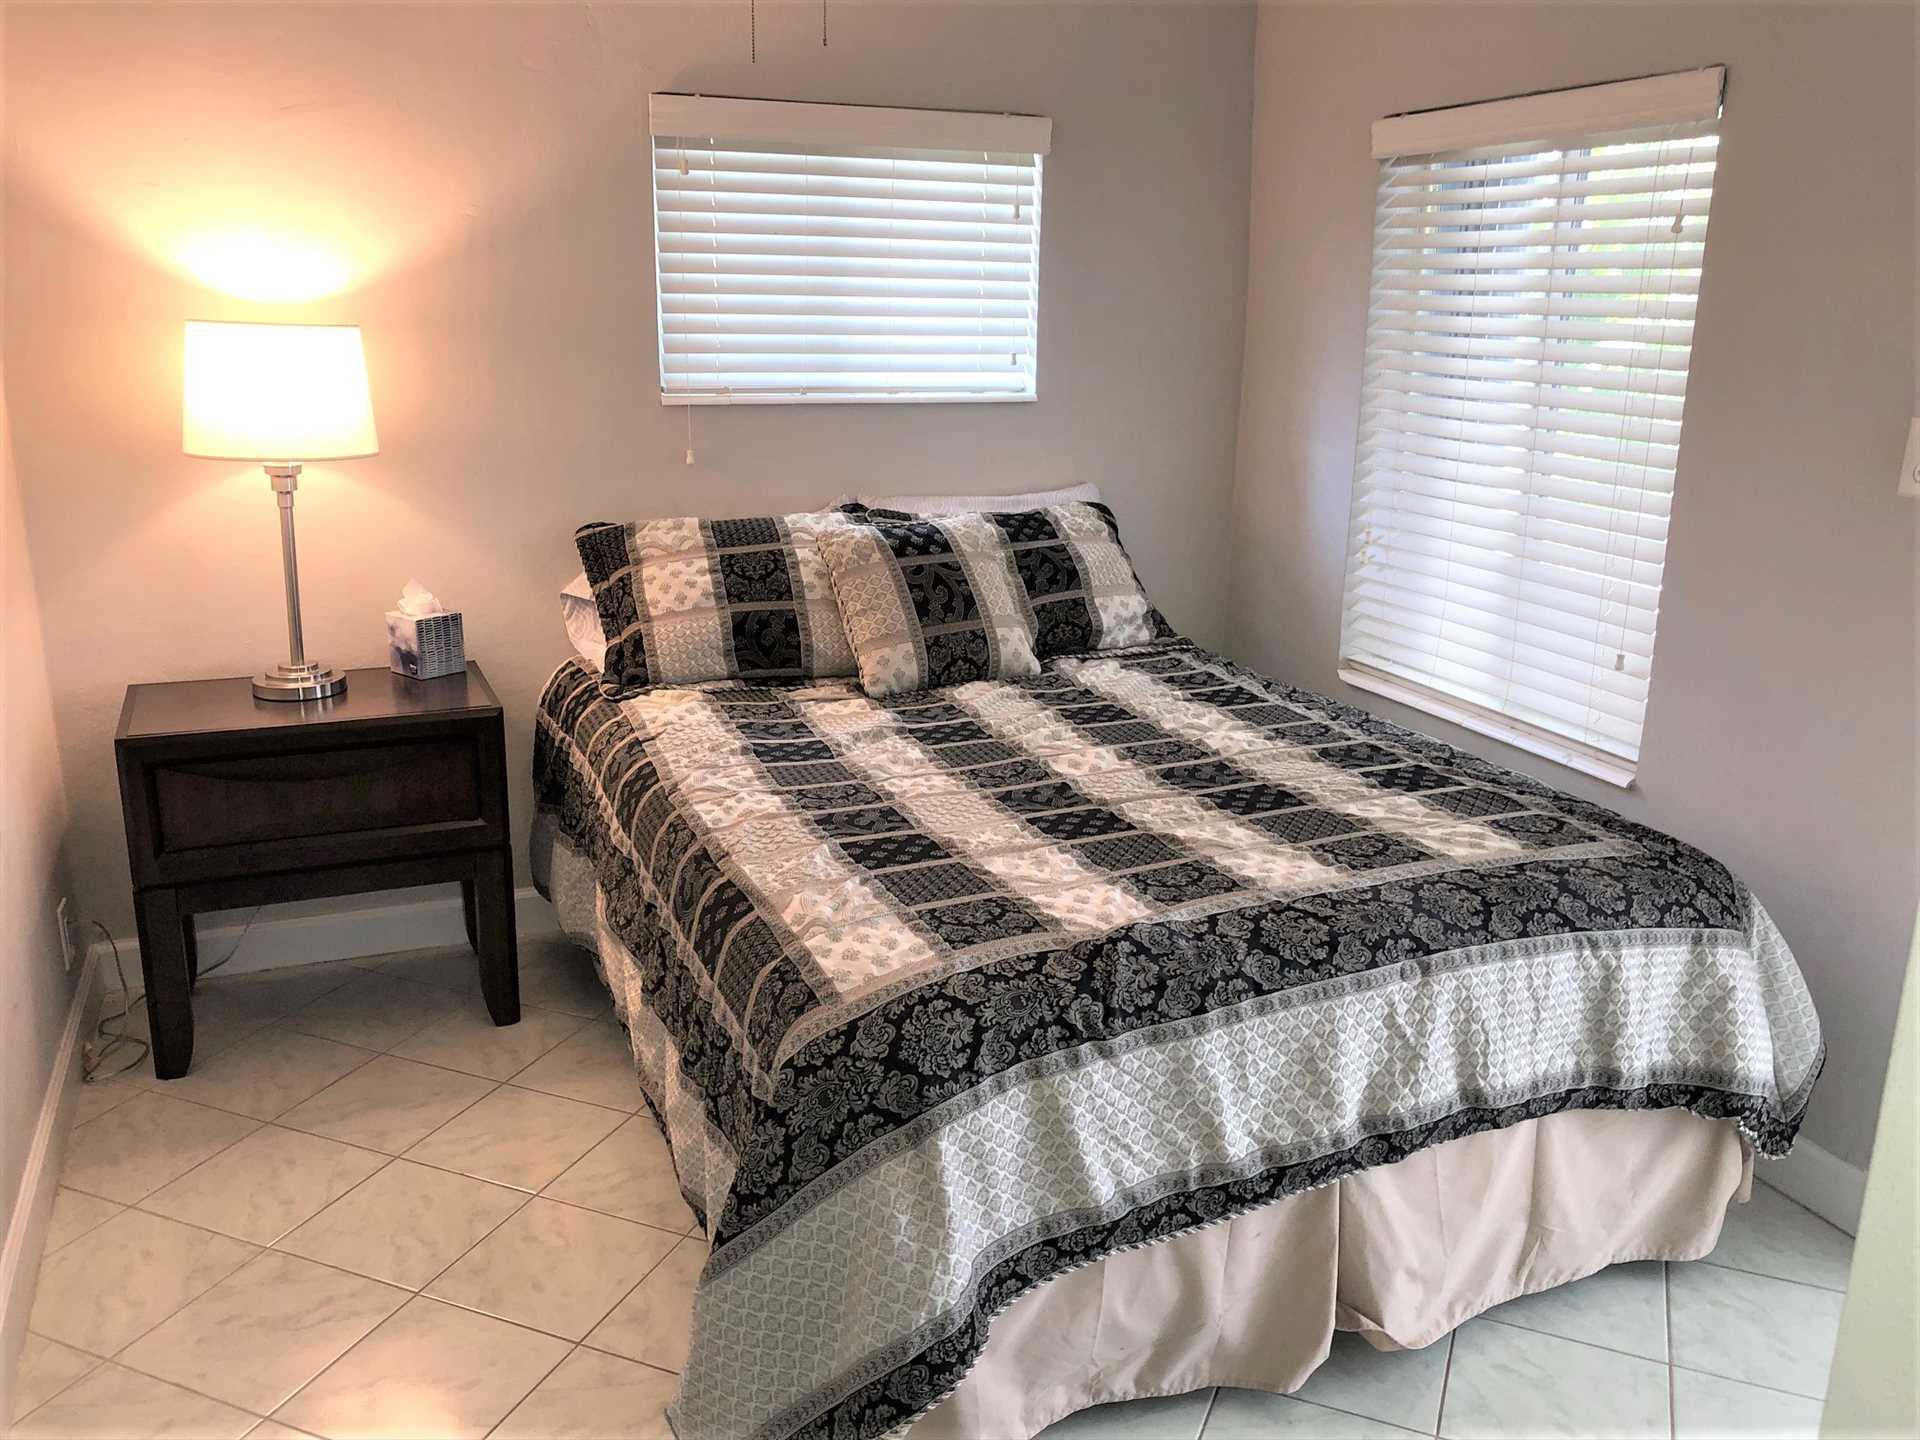 Third bedroom has queen bed and ensuite bath.